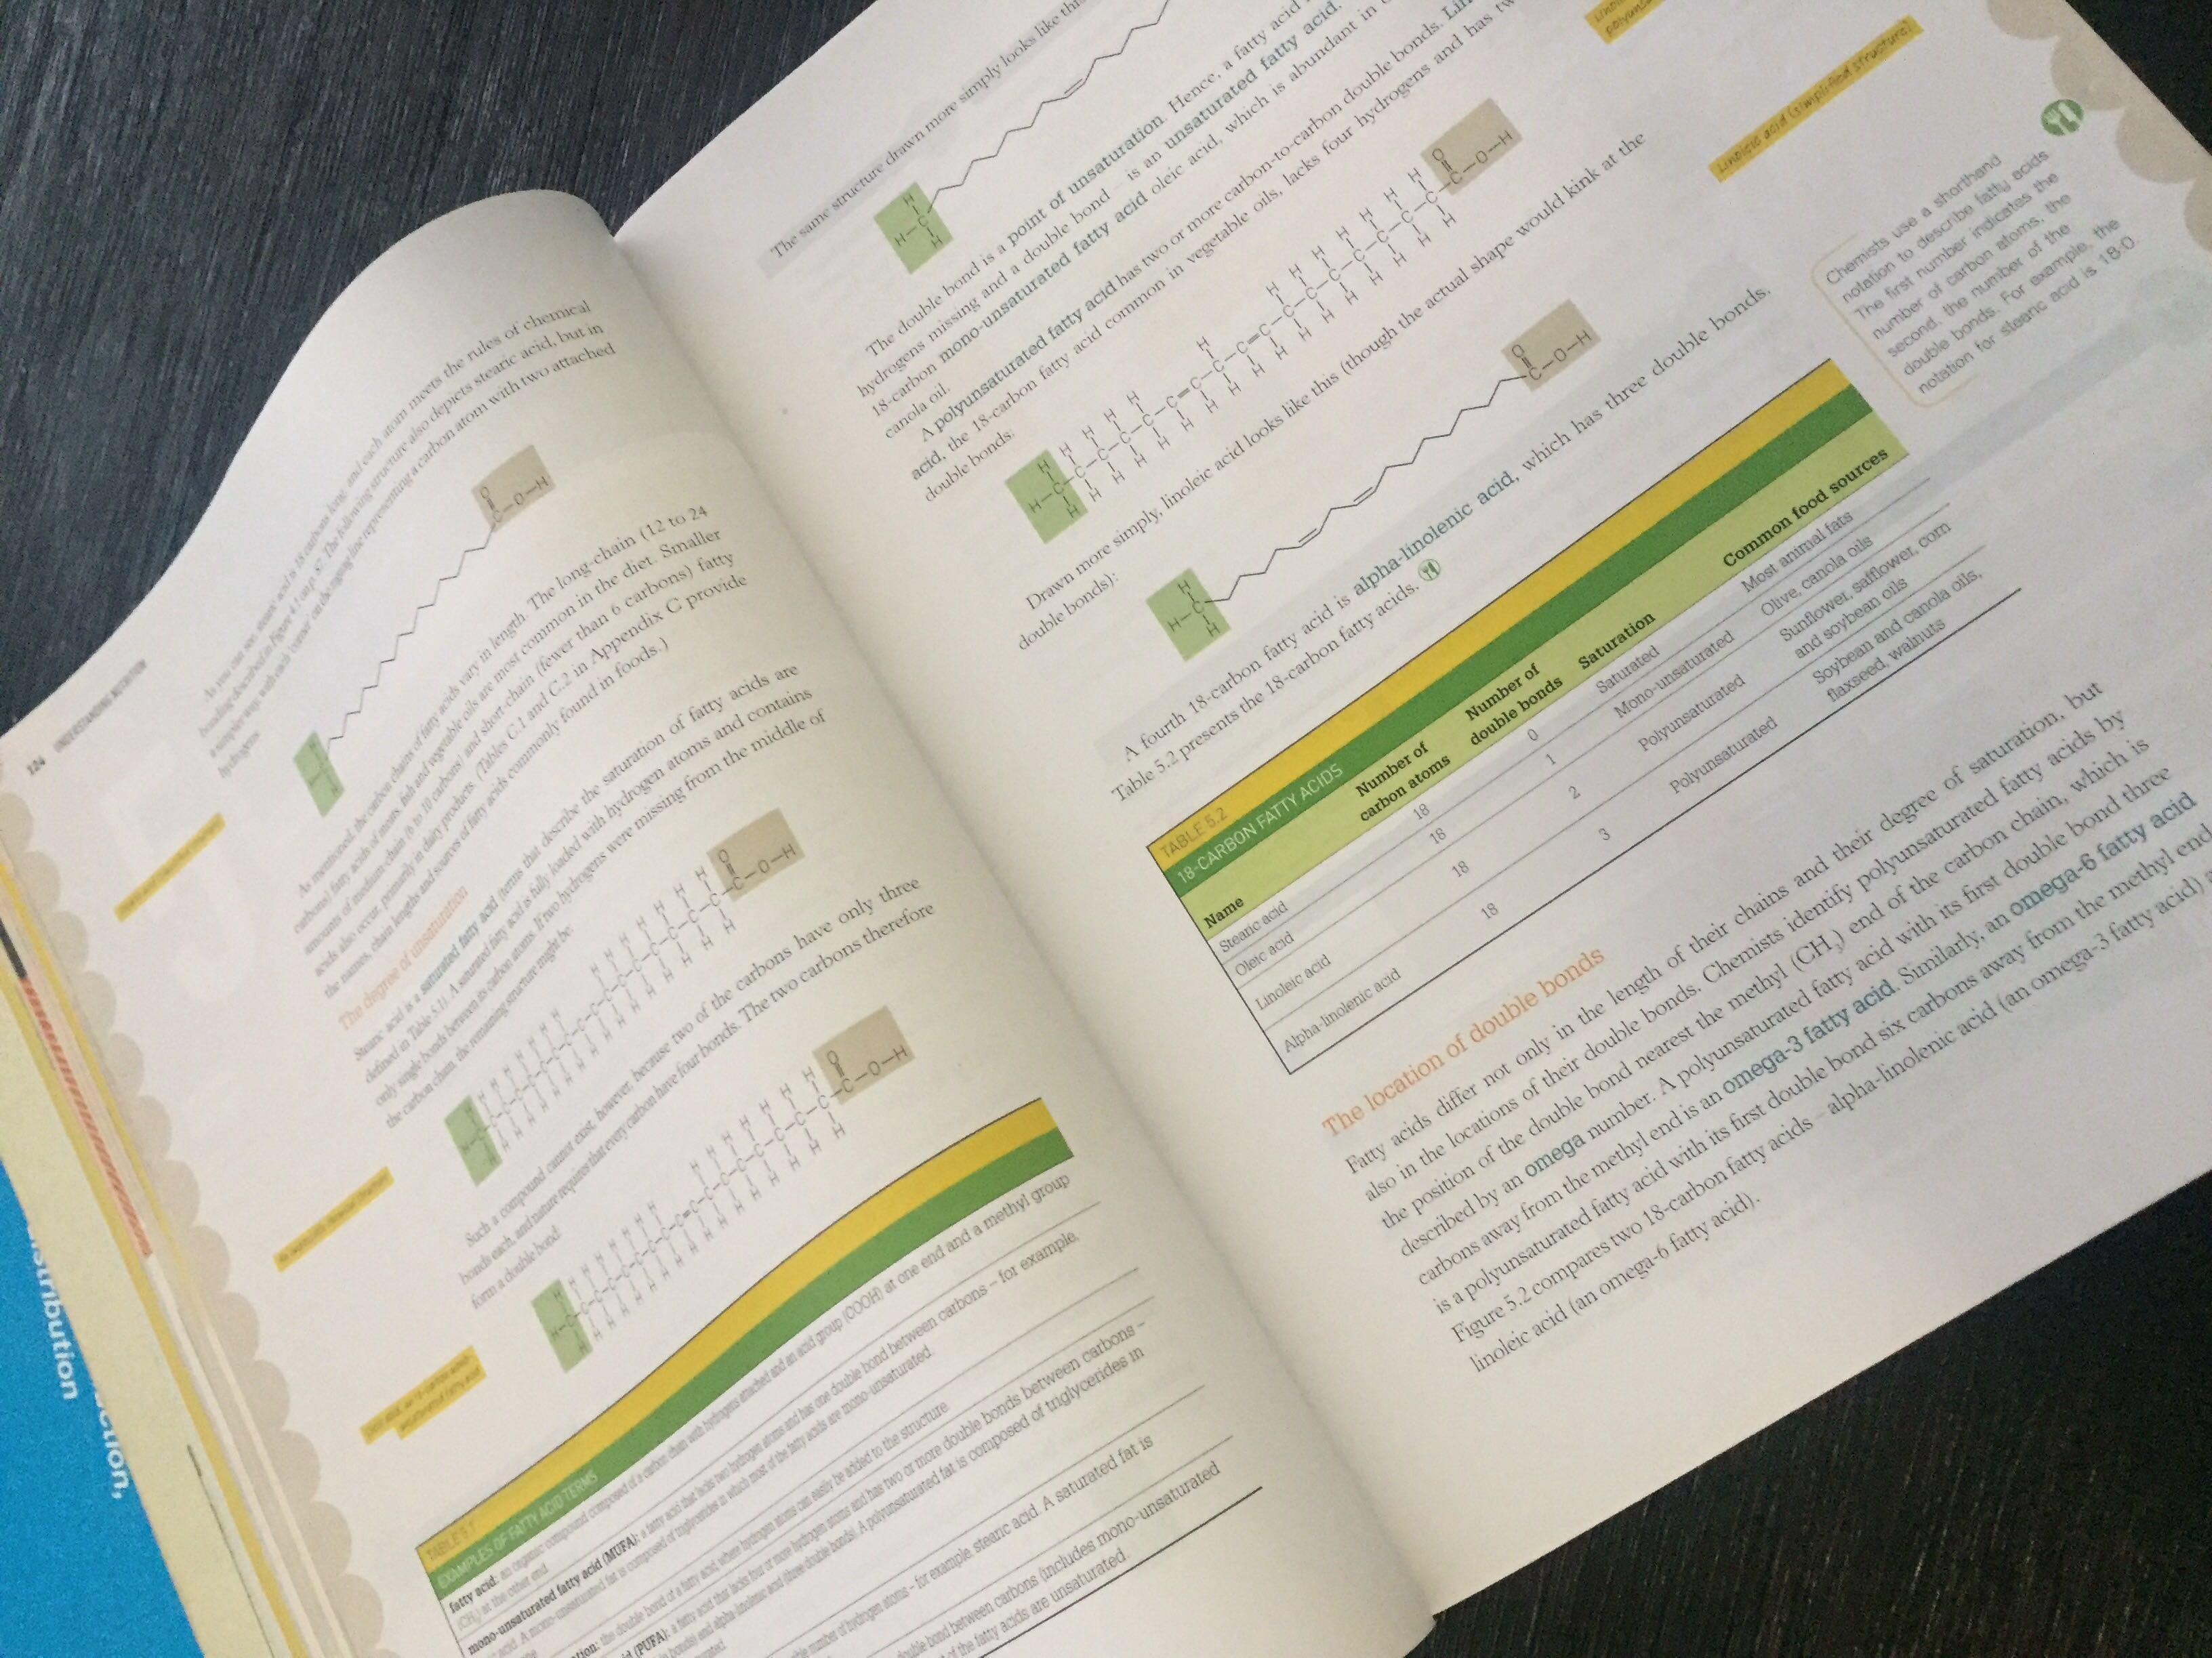 Understanding Nutrition (University textbook)